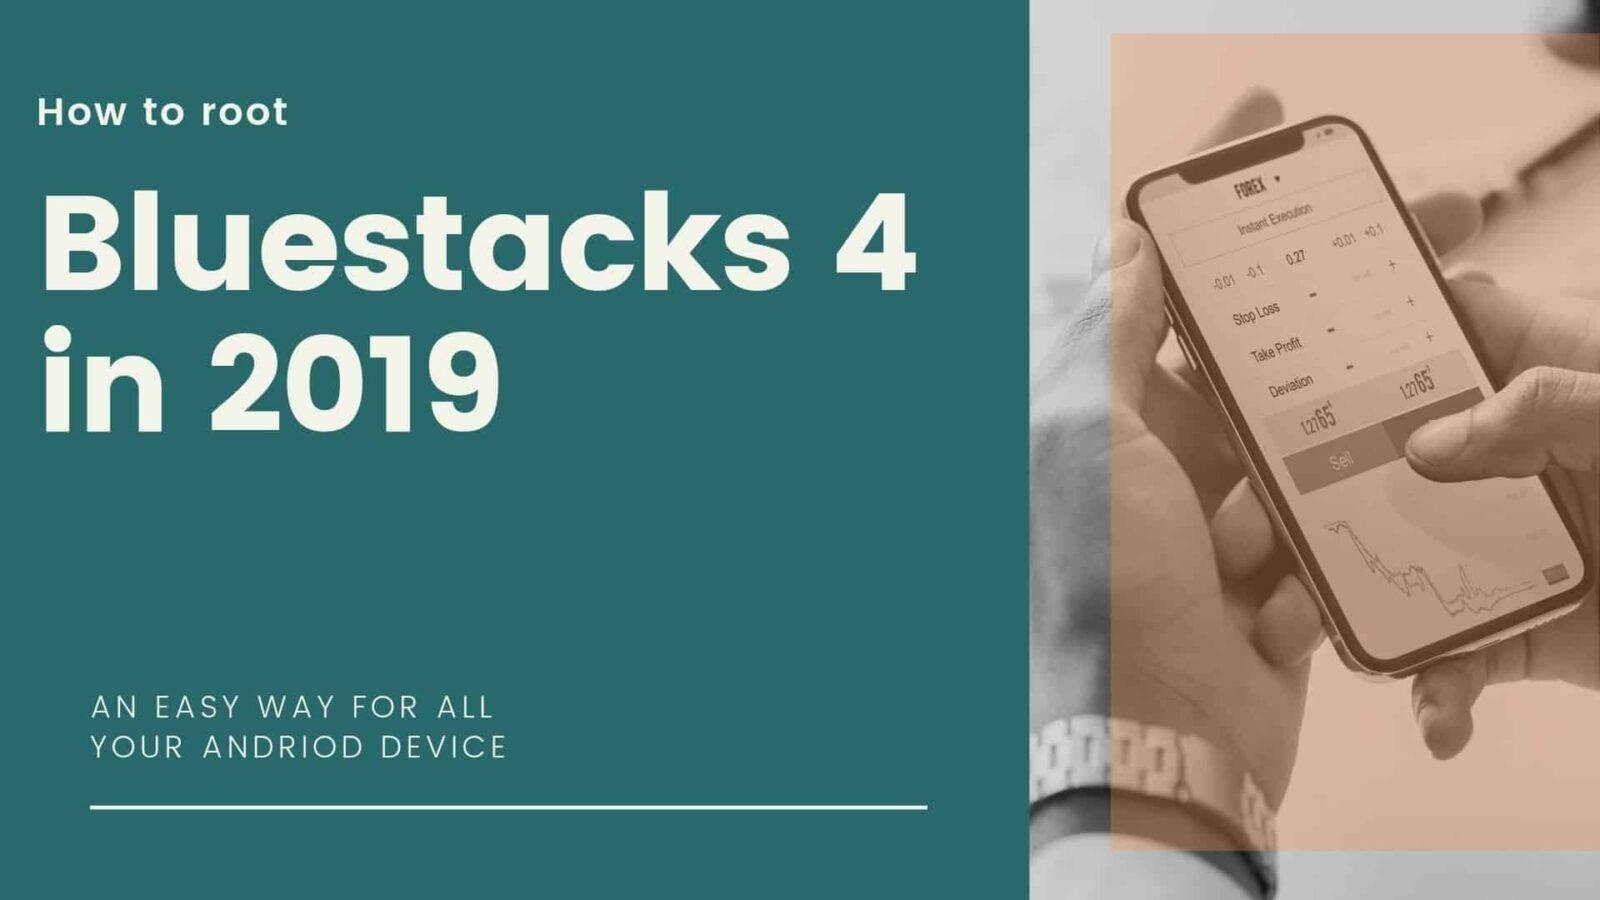 How To Root Bluestacks 4 bstweaker 2020 (Updated)